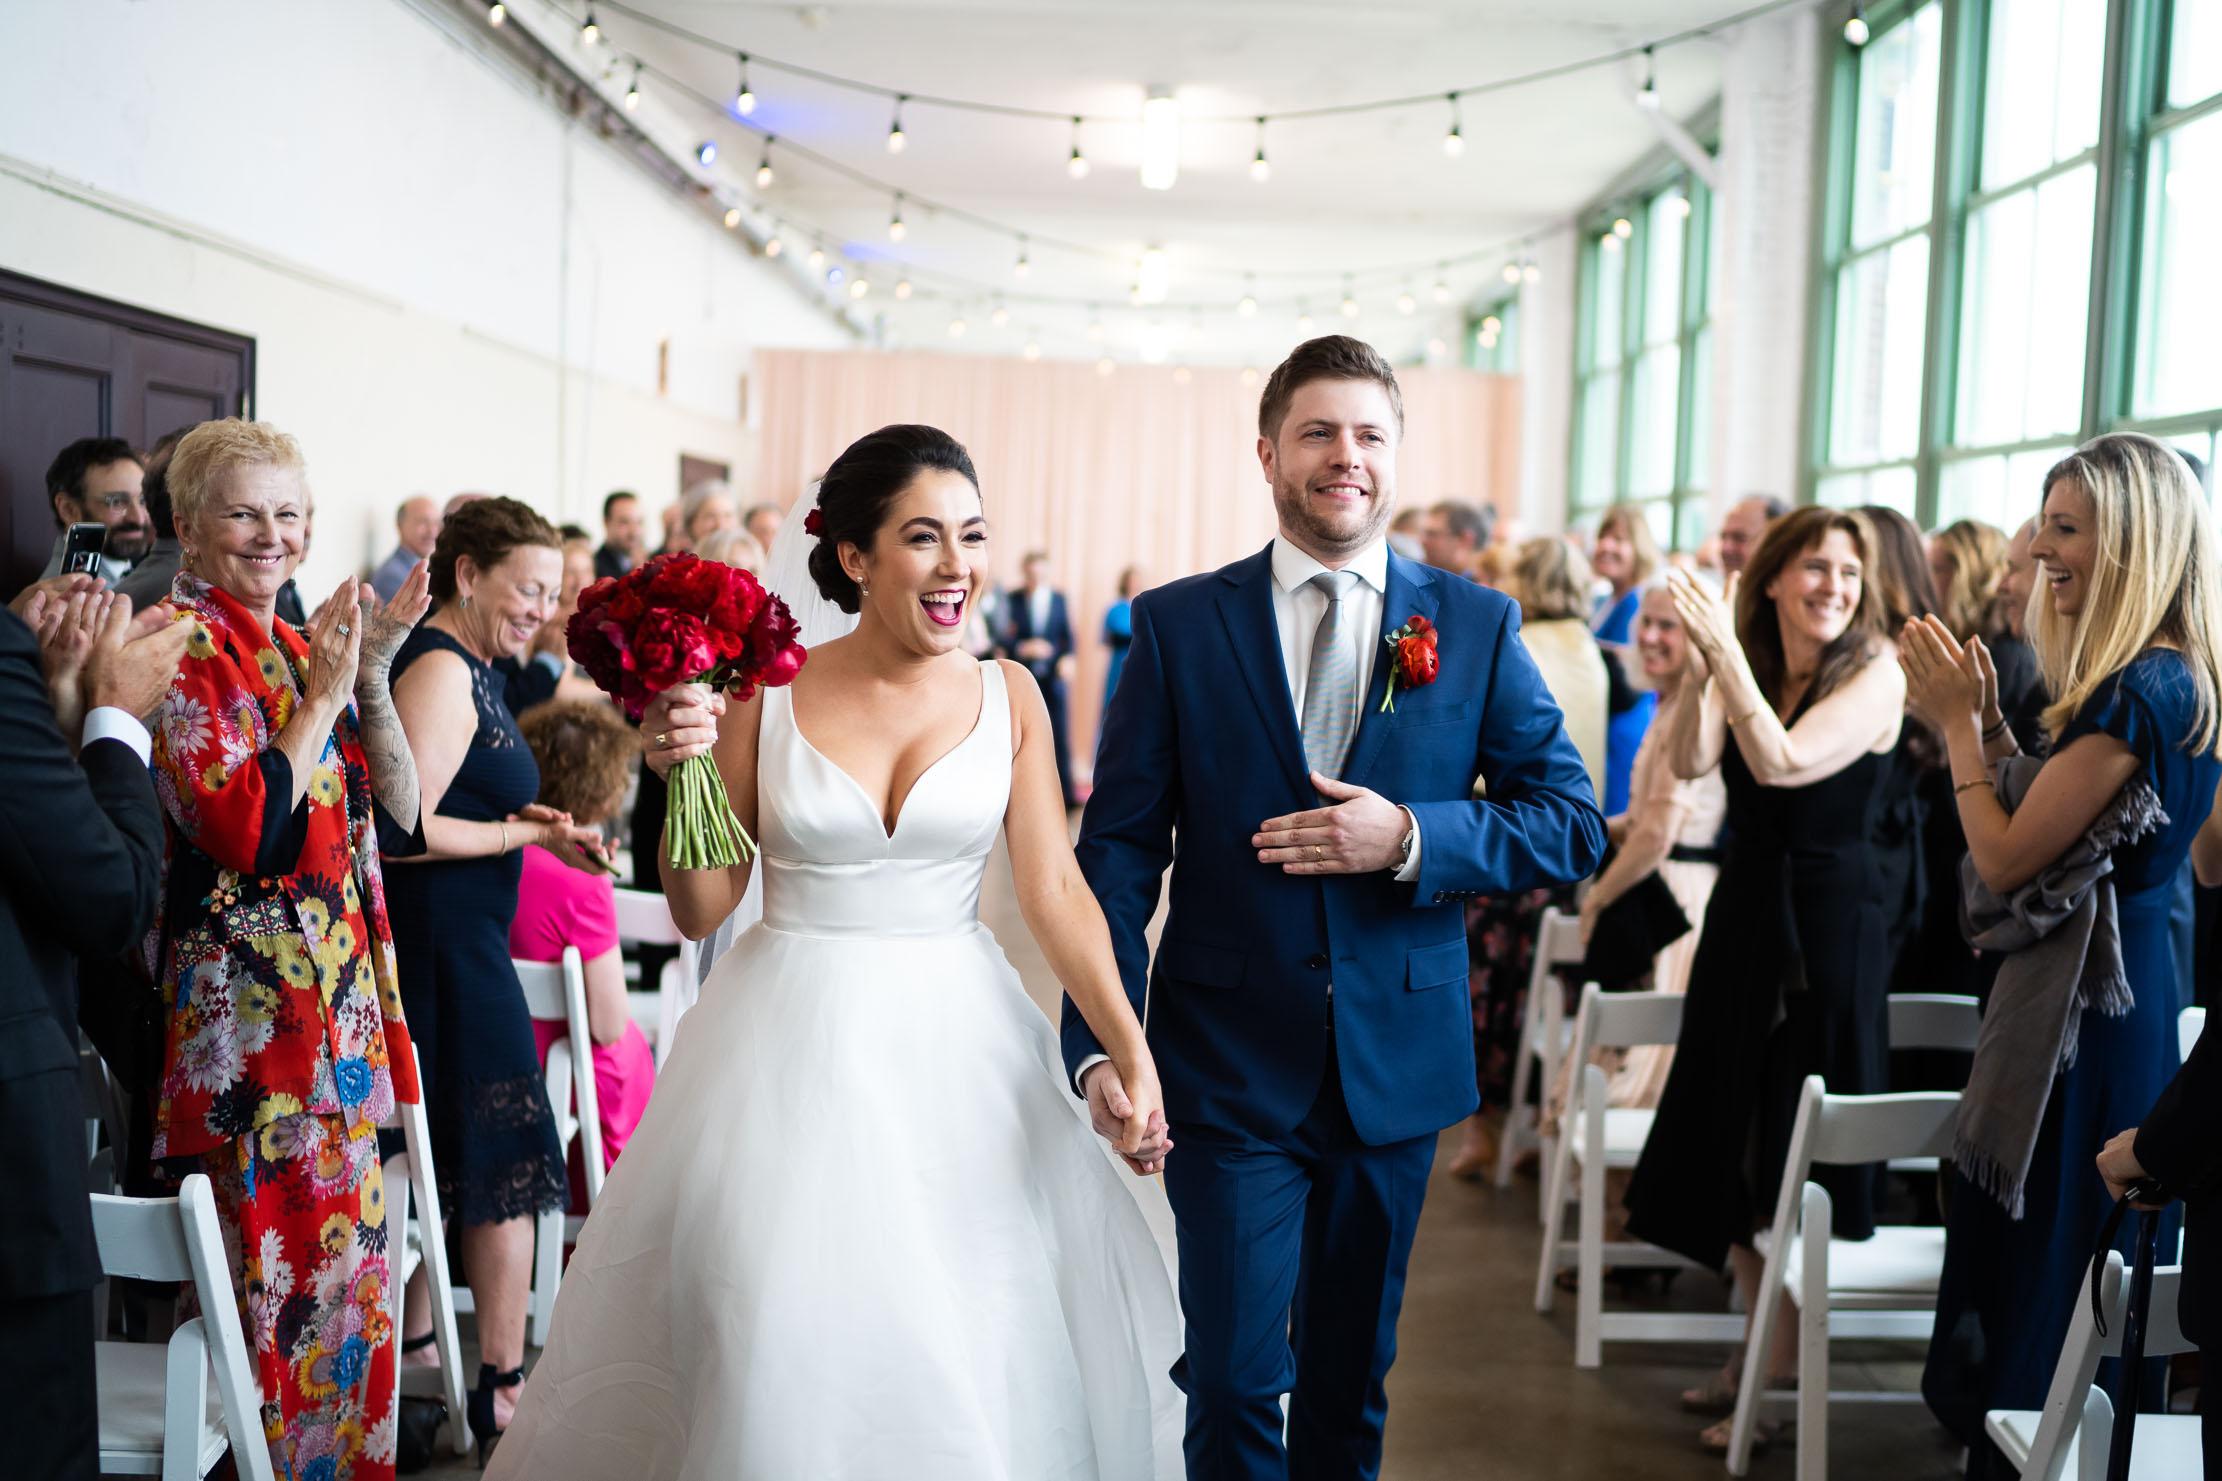 Asbury-Park-Convention-Hall-Wedding-2074.jpg